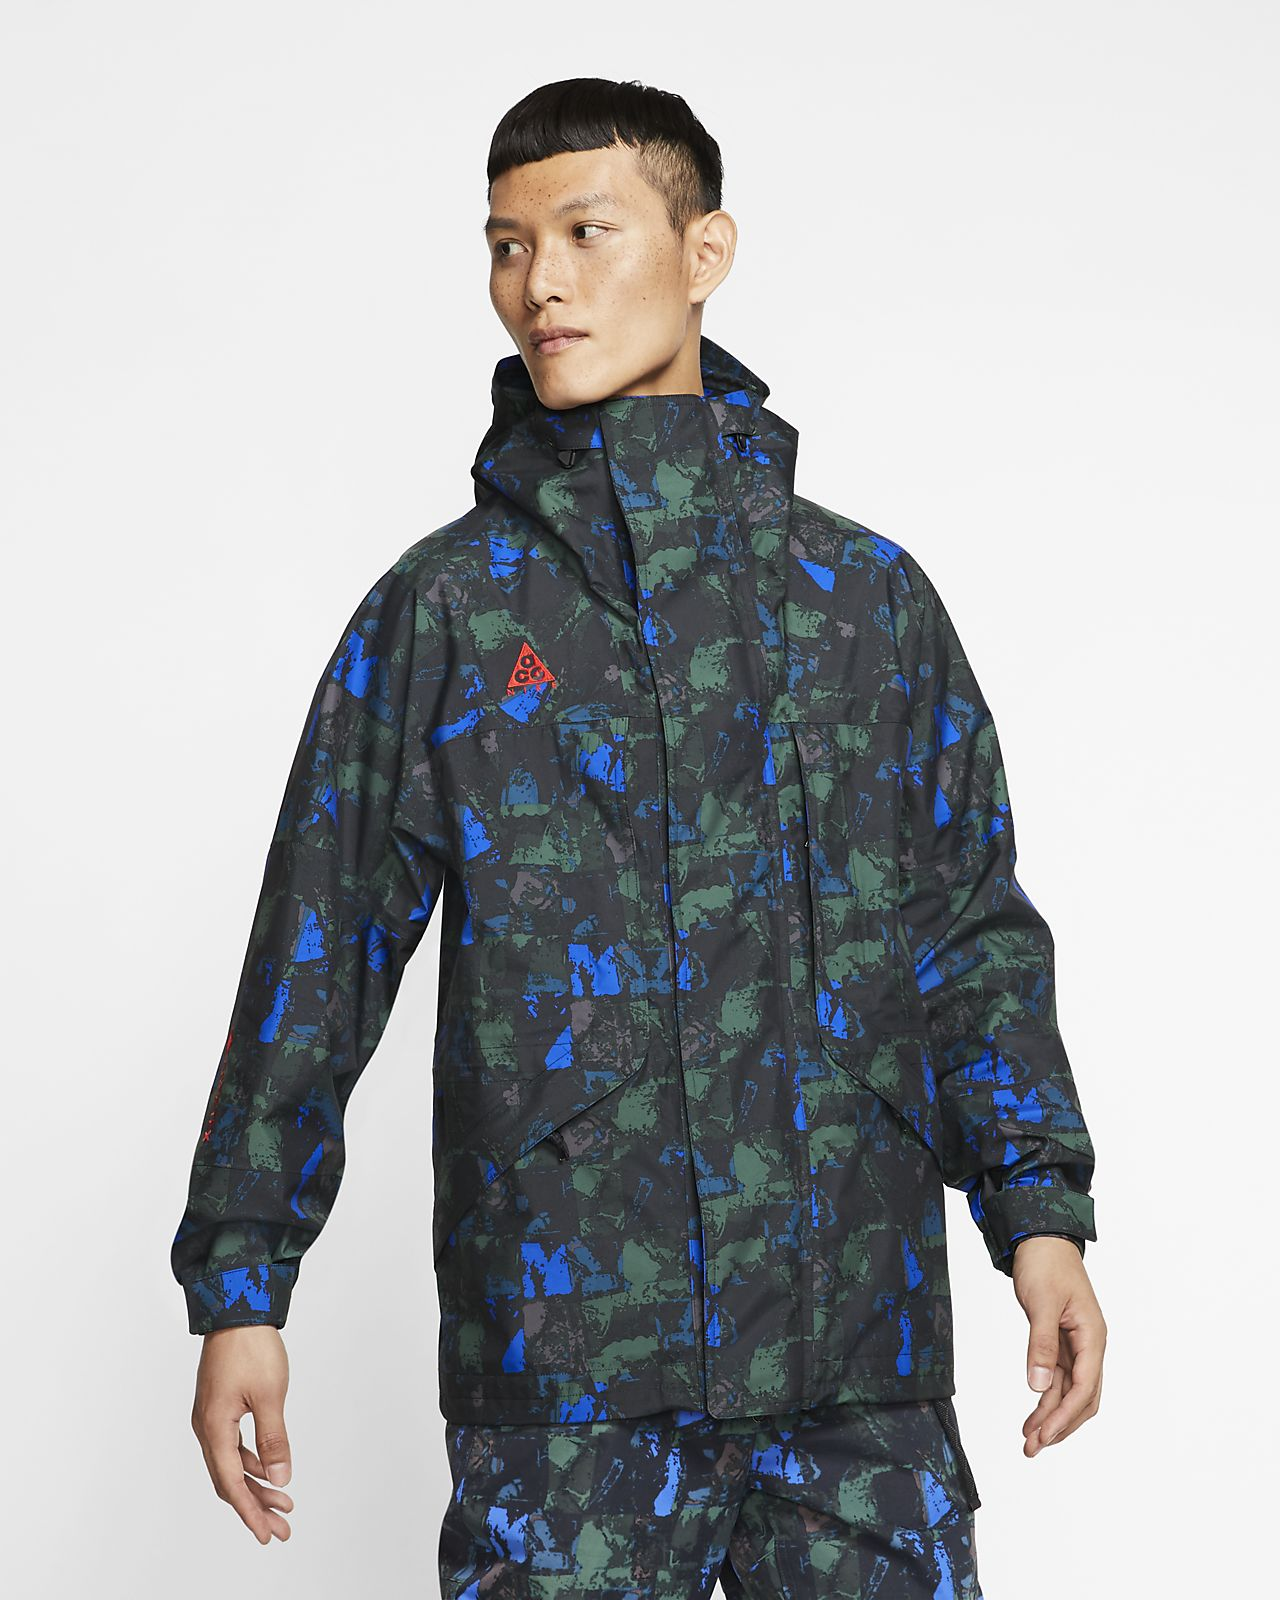 Pánská bunda Nike ACG GORE-TEX s celoplošným potiskem